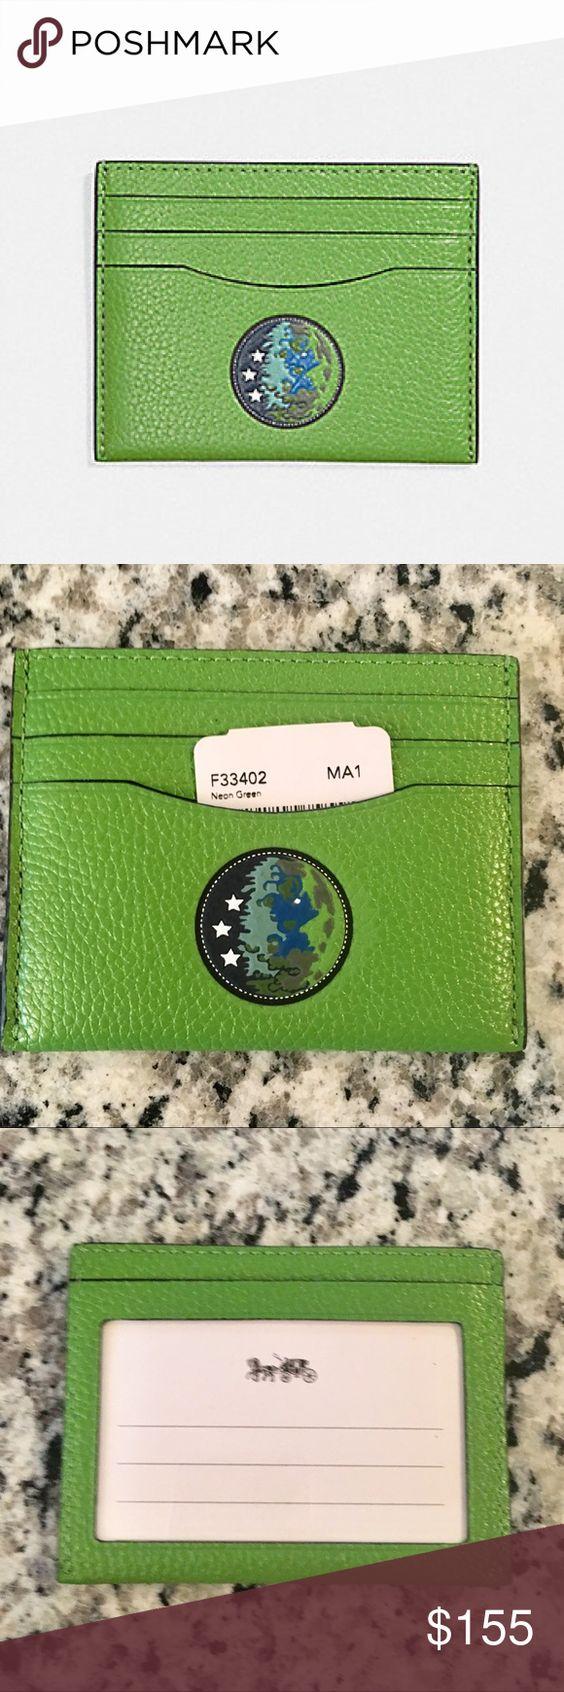 Coach X Nasa Id Card With Earth Motif